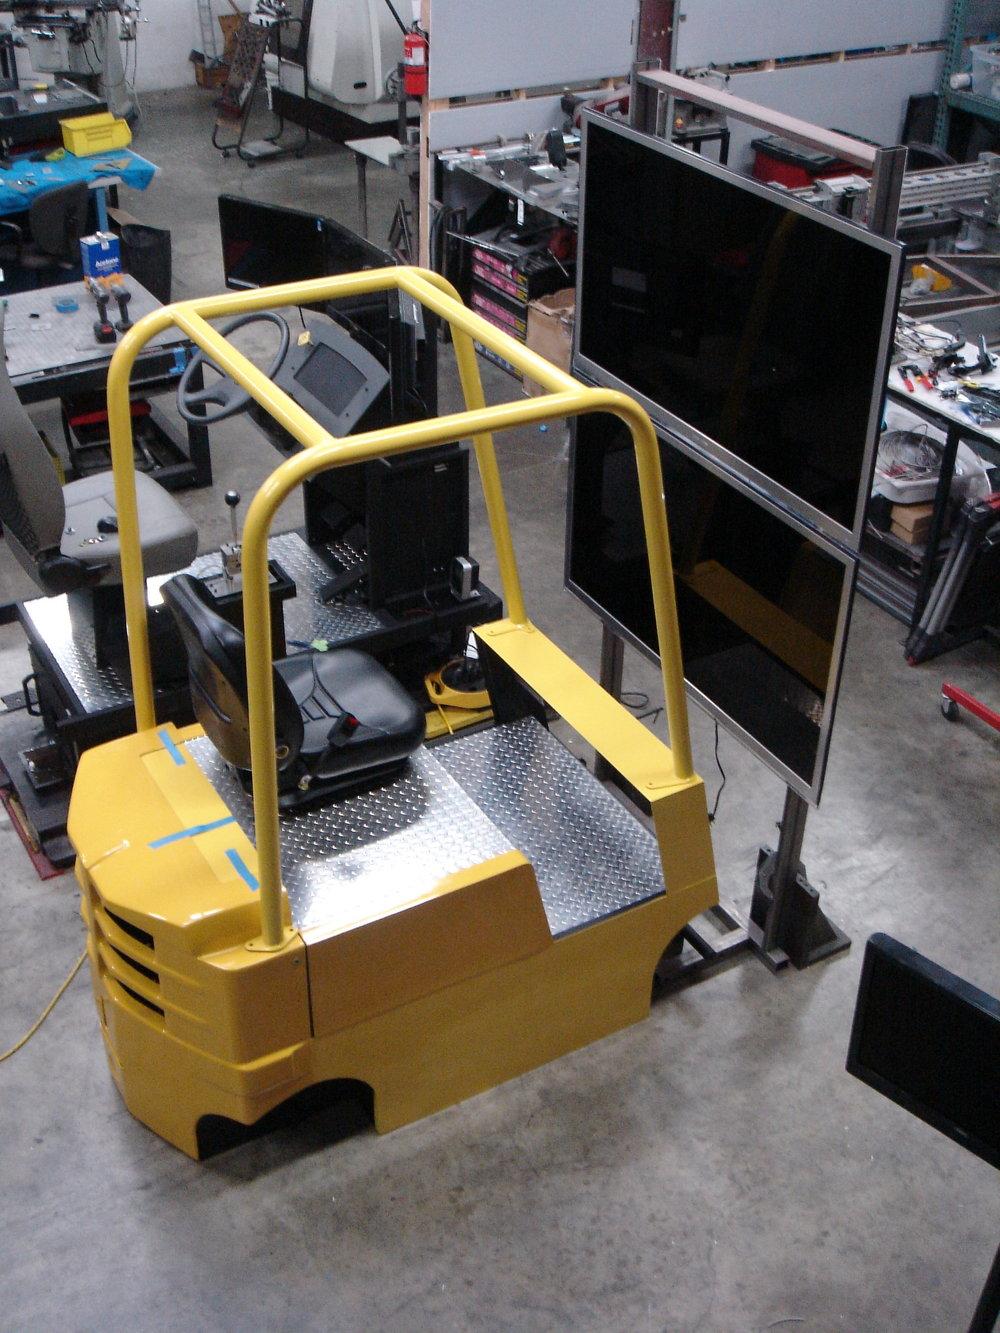 Cab Simulator Assembly